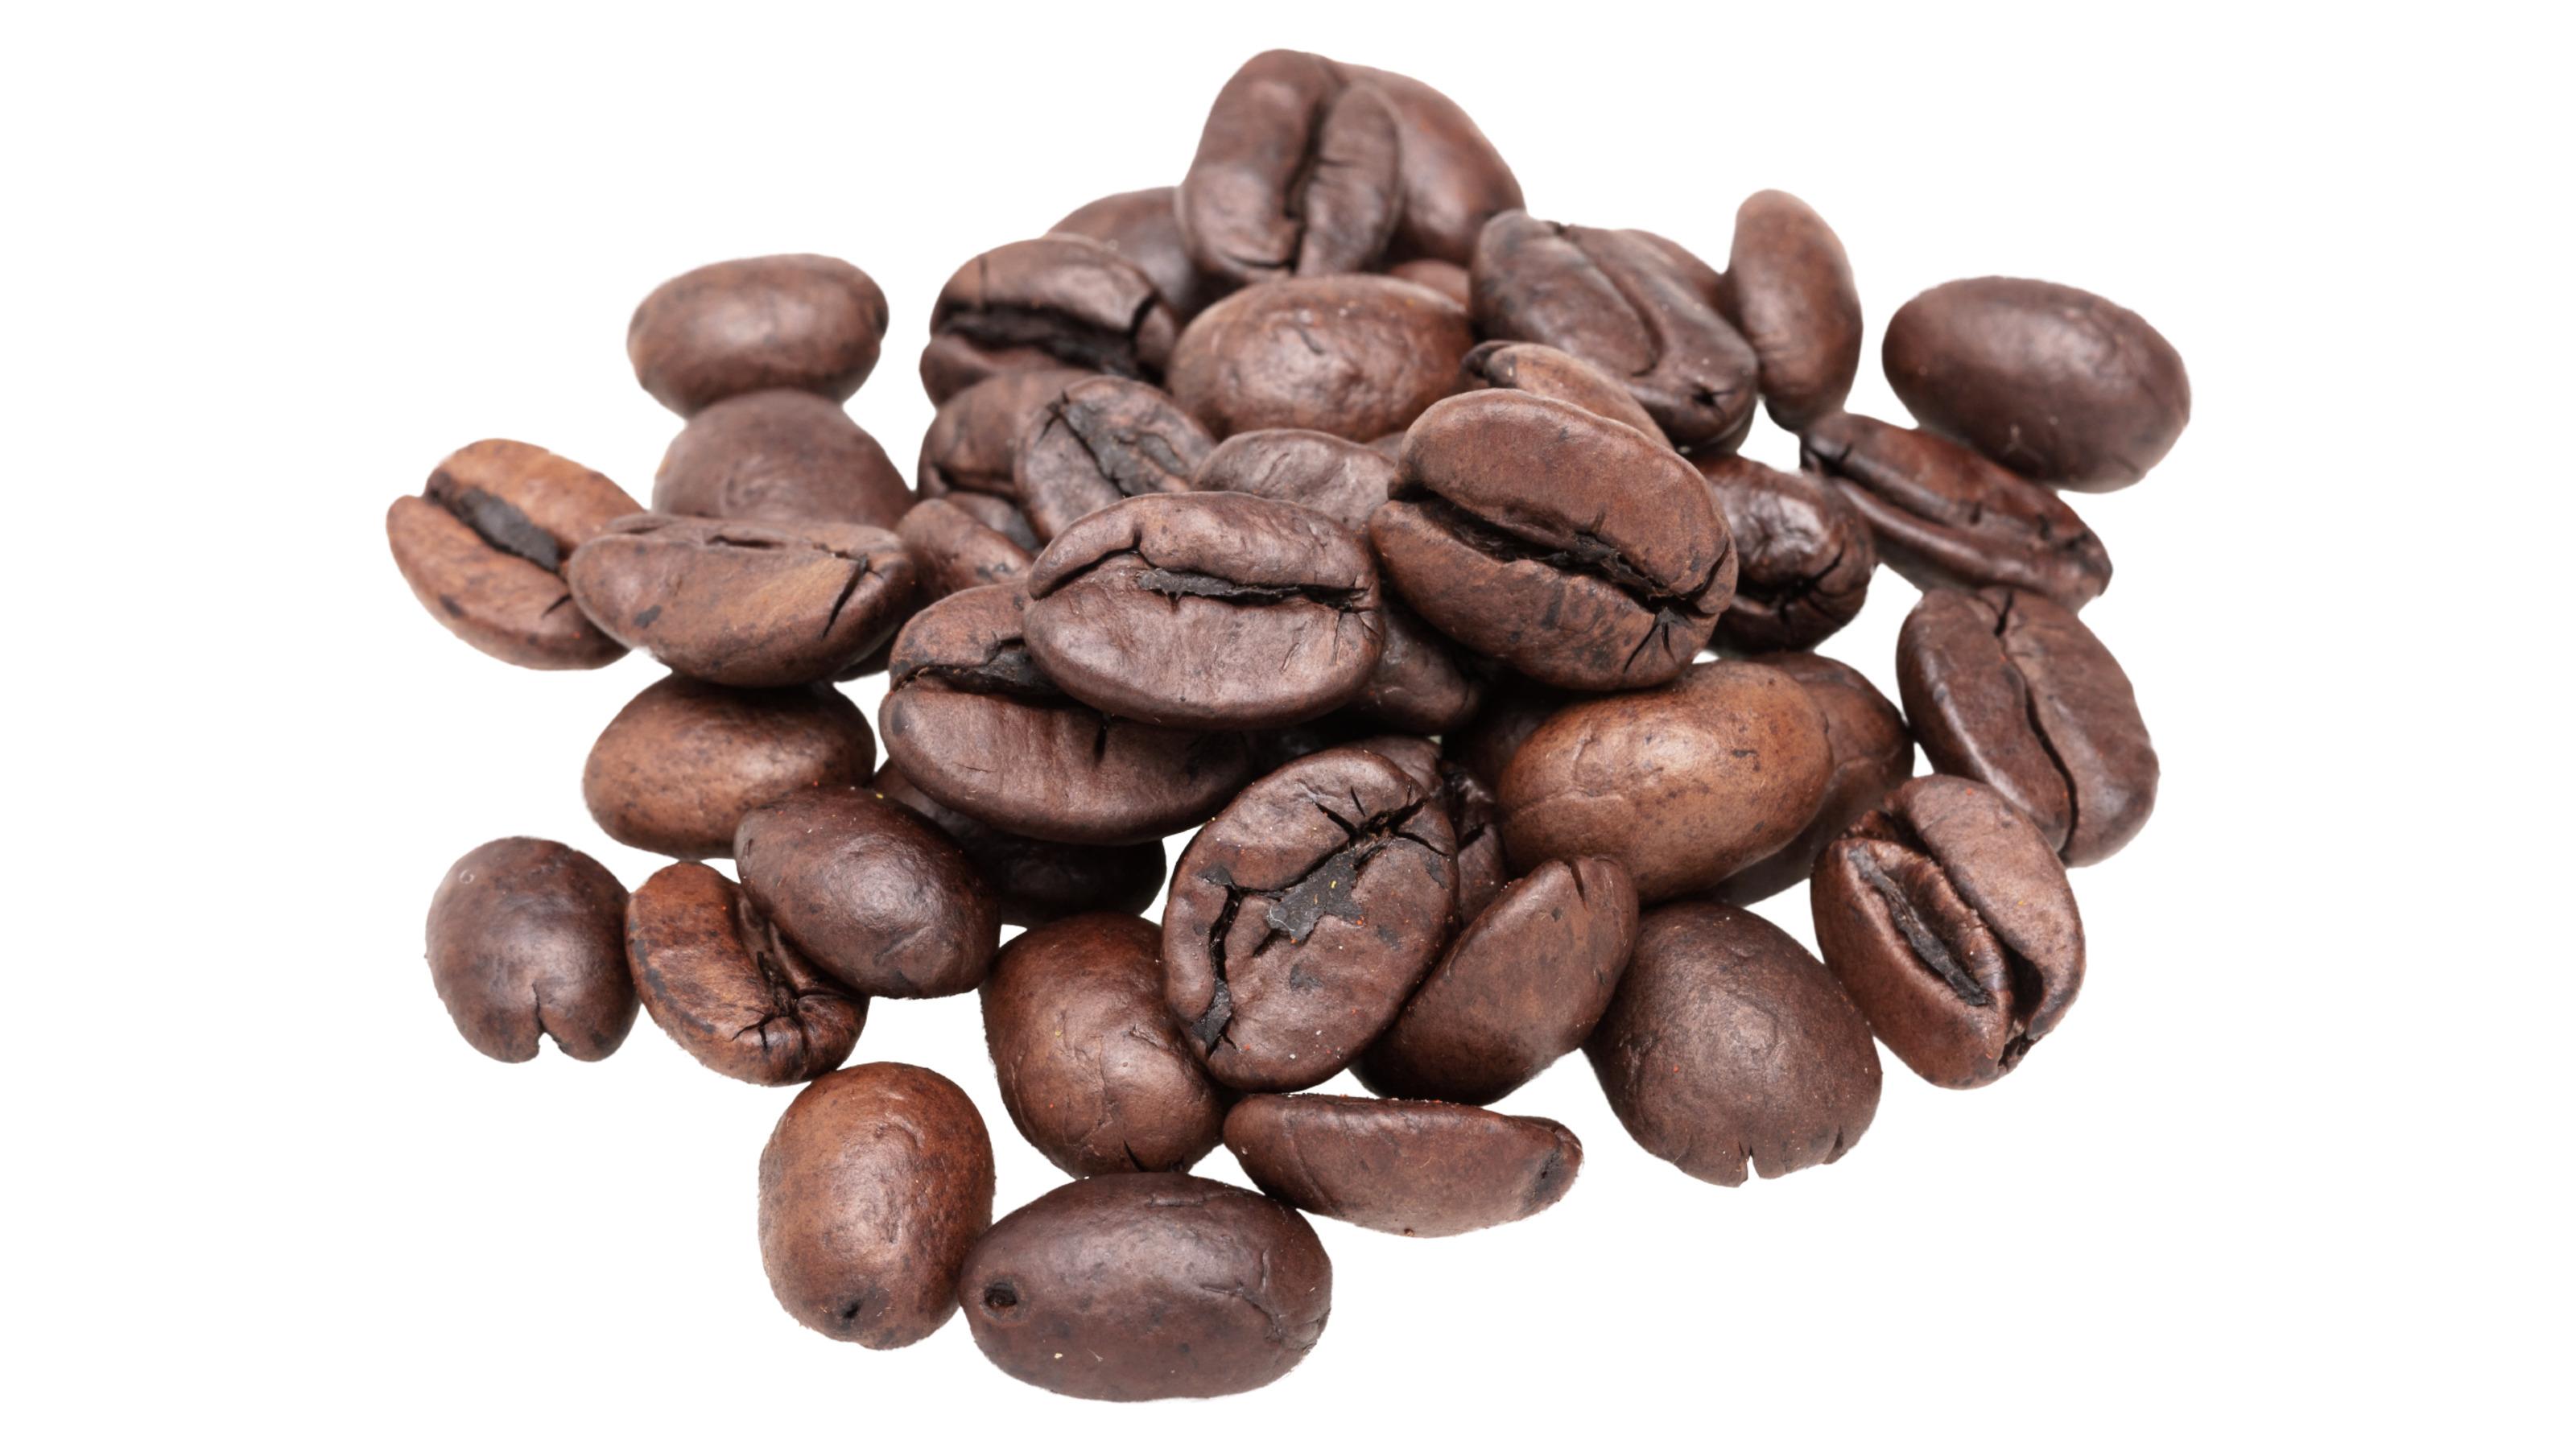 Roasted whole beans